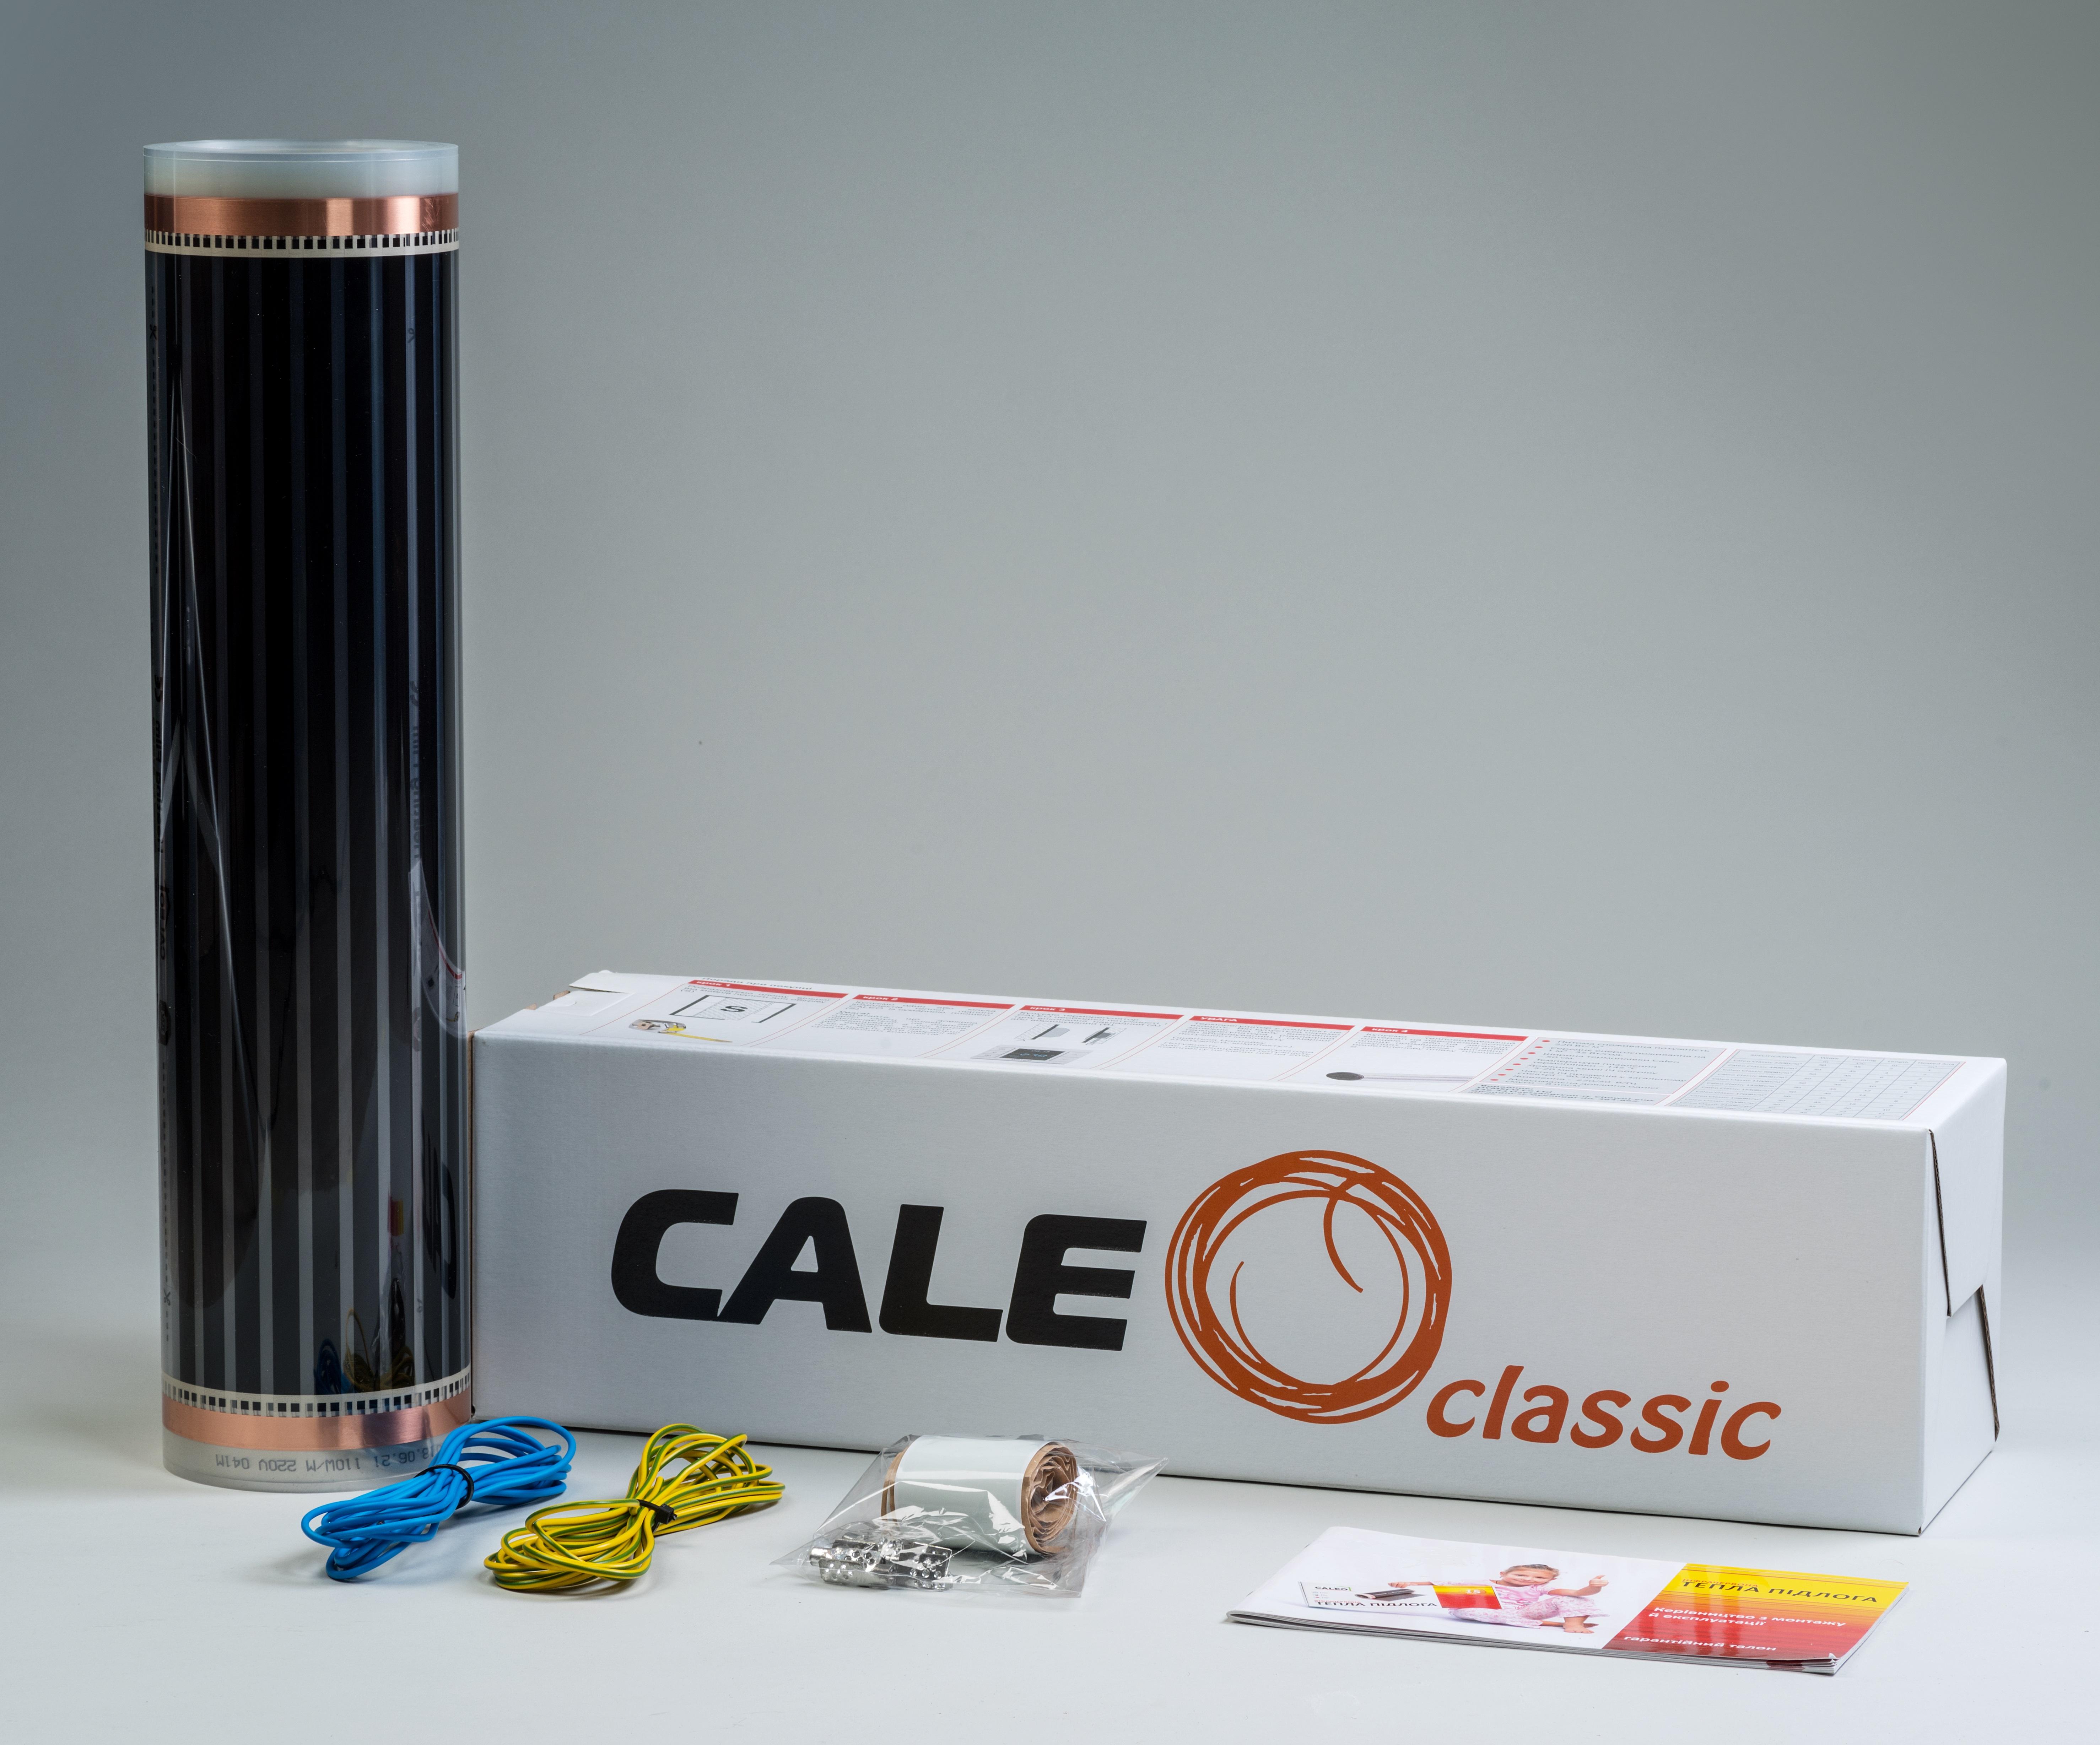 caleo (южная корея) Caleo Classic 220-0,5-4 (4 м2) Caleo Classic 220-0,5-4.0